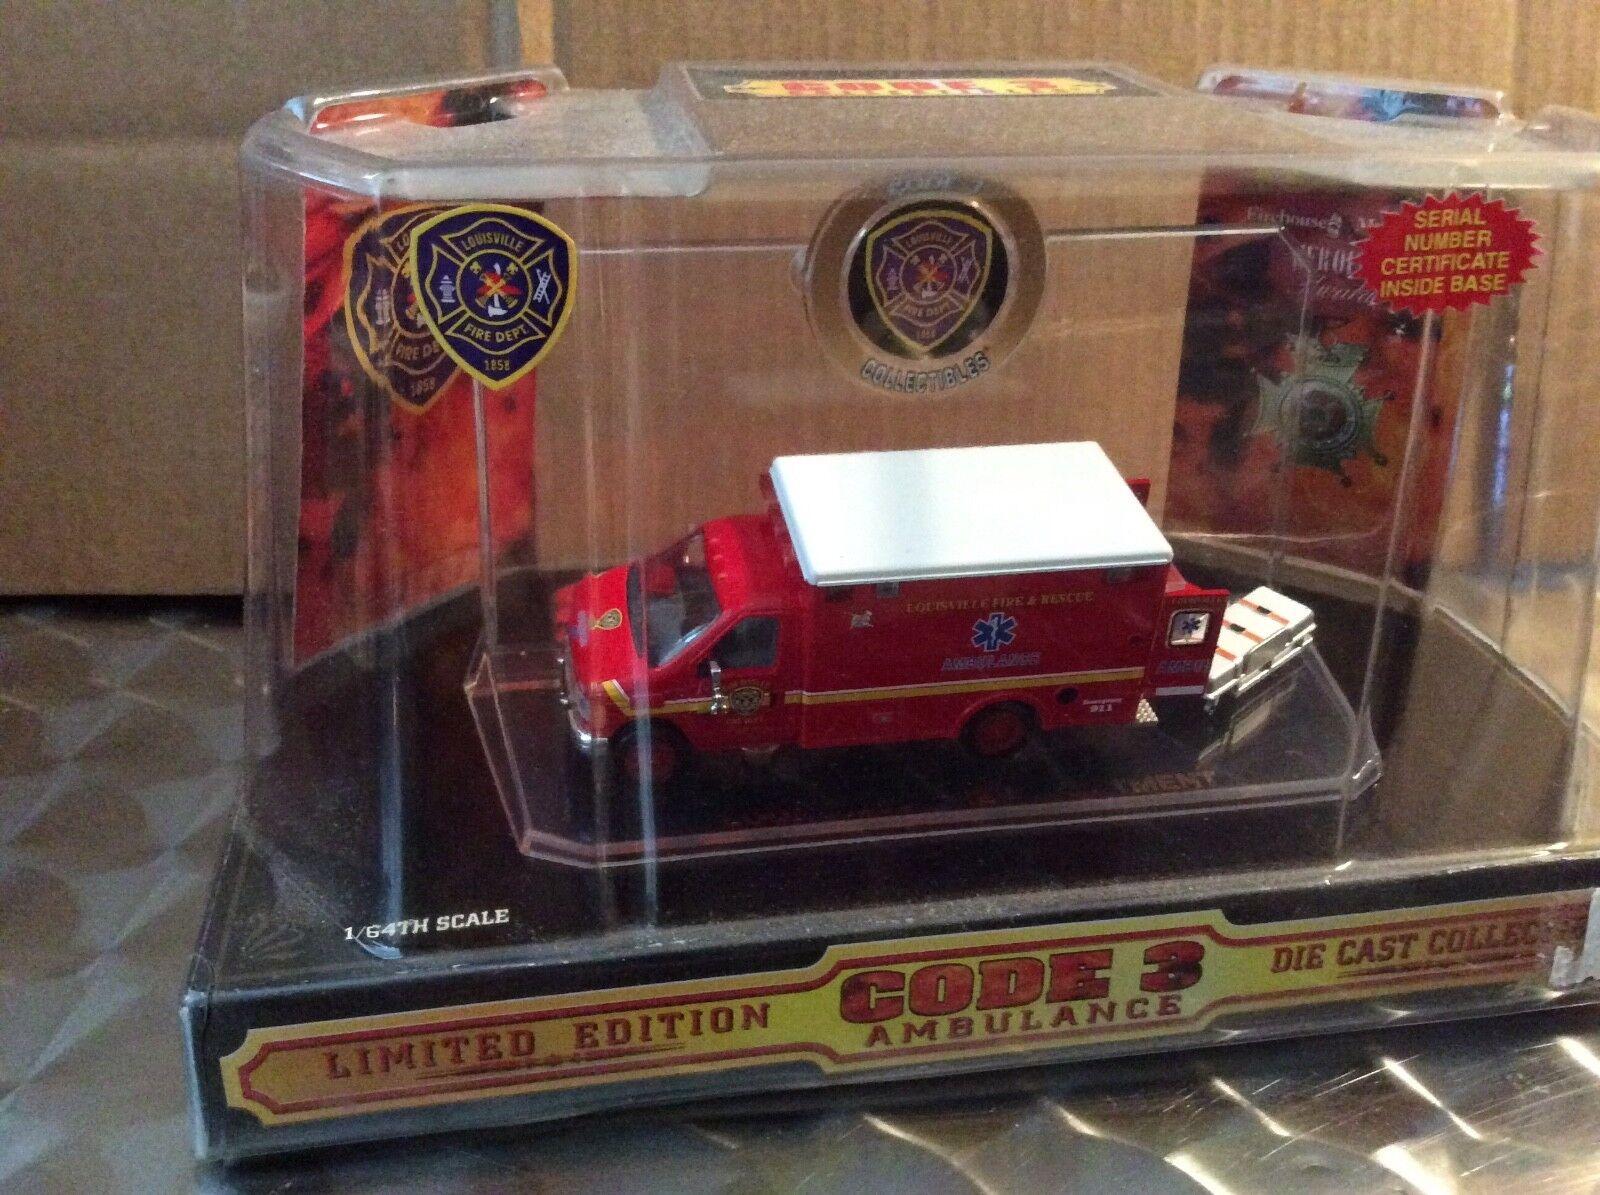 Louisville  Fire Dept. Ford E350 92- 97 RESCUE Code 3 2003 van 12054 ambulance